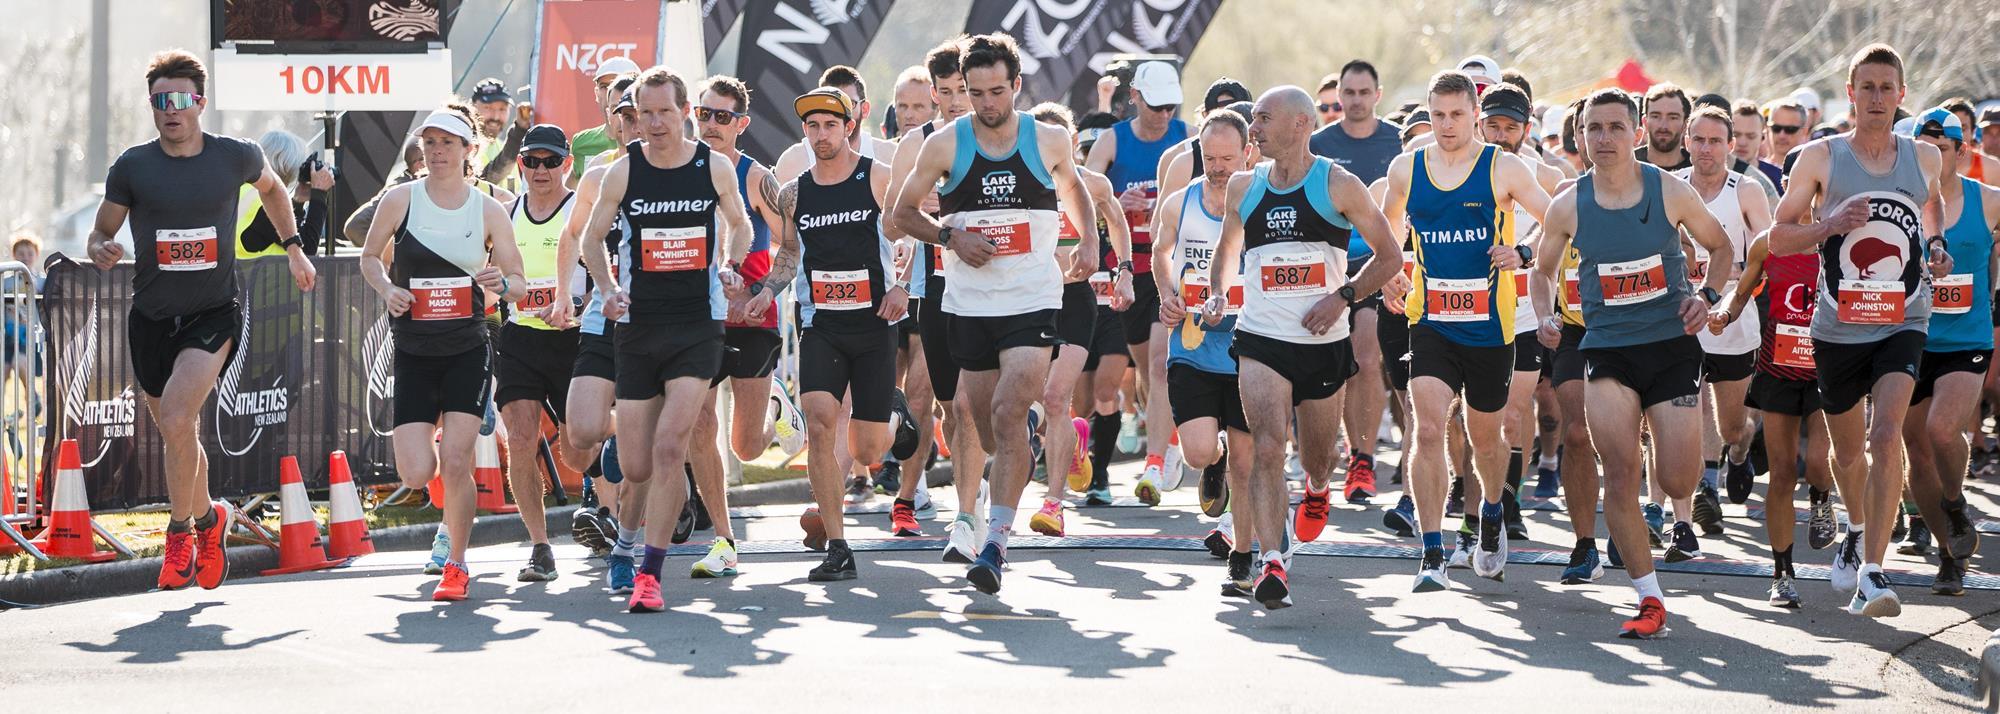 World Athletics   Sparking glimmers of hope, mass racing returns with Rotorua Marathon  News